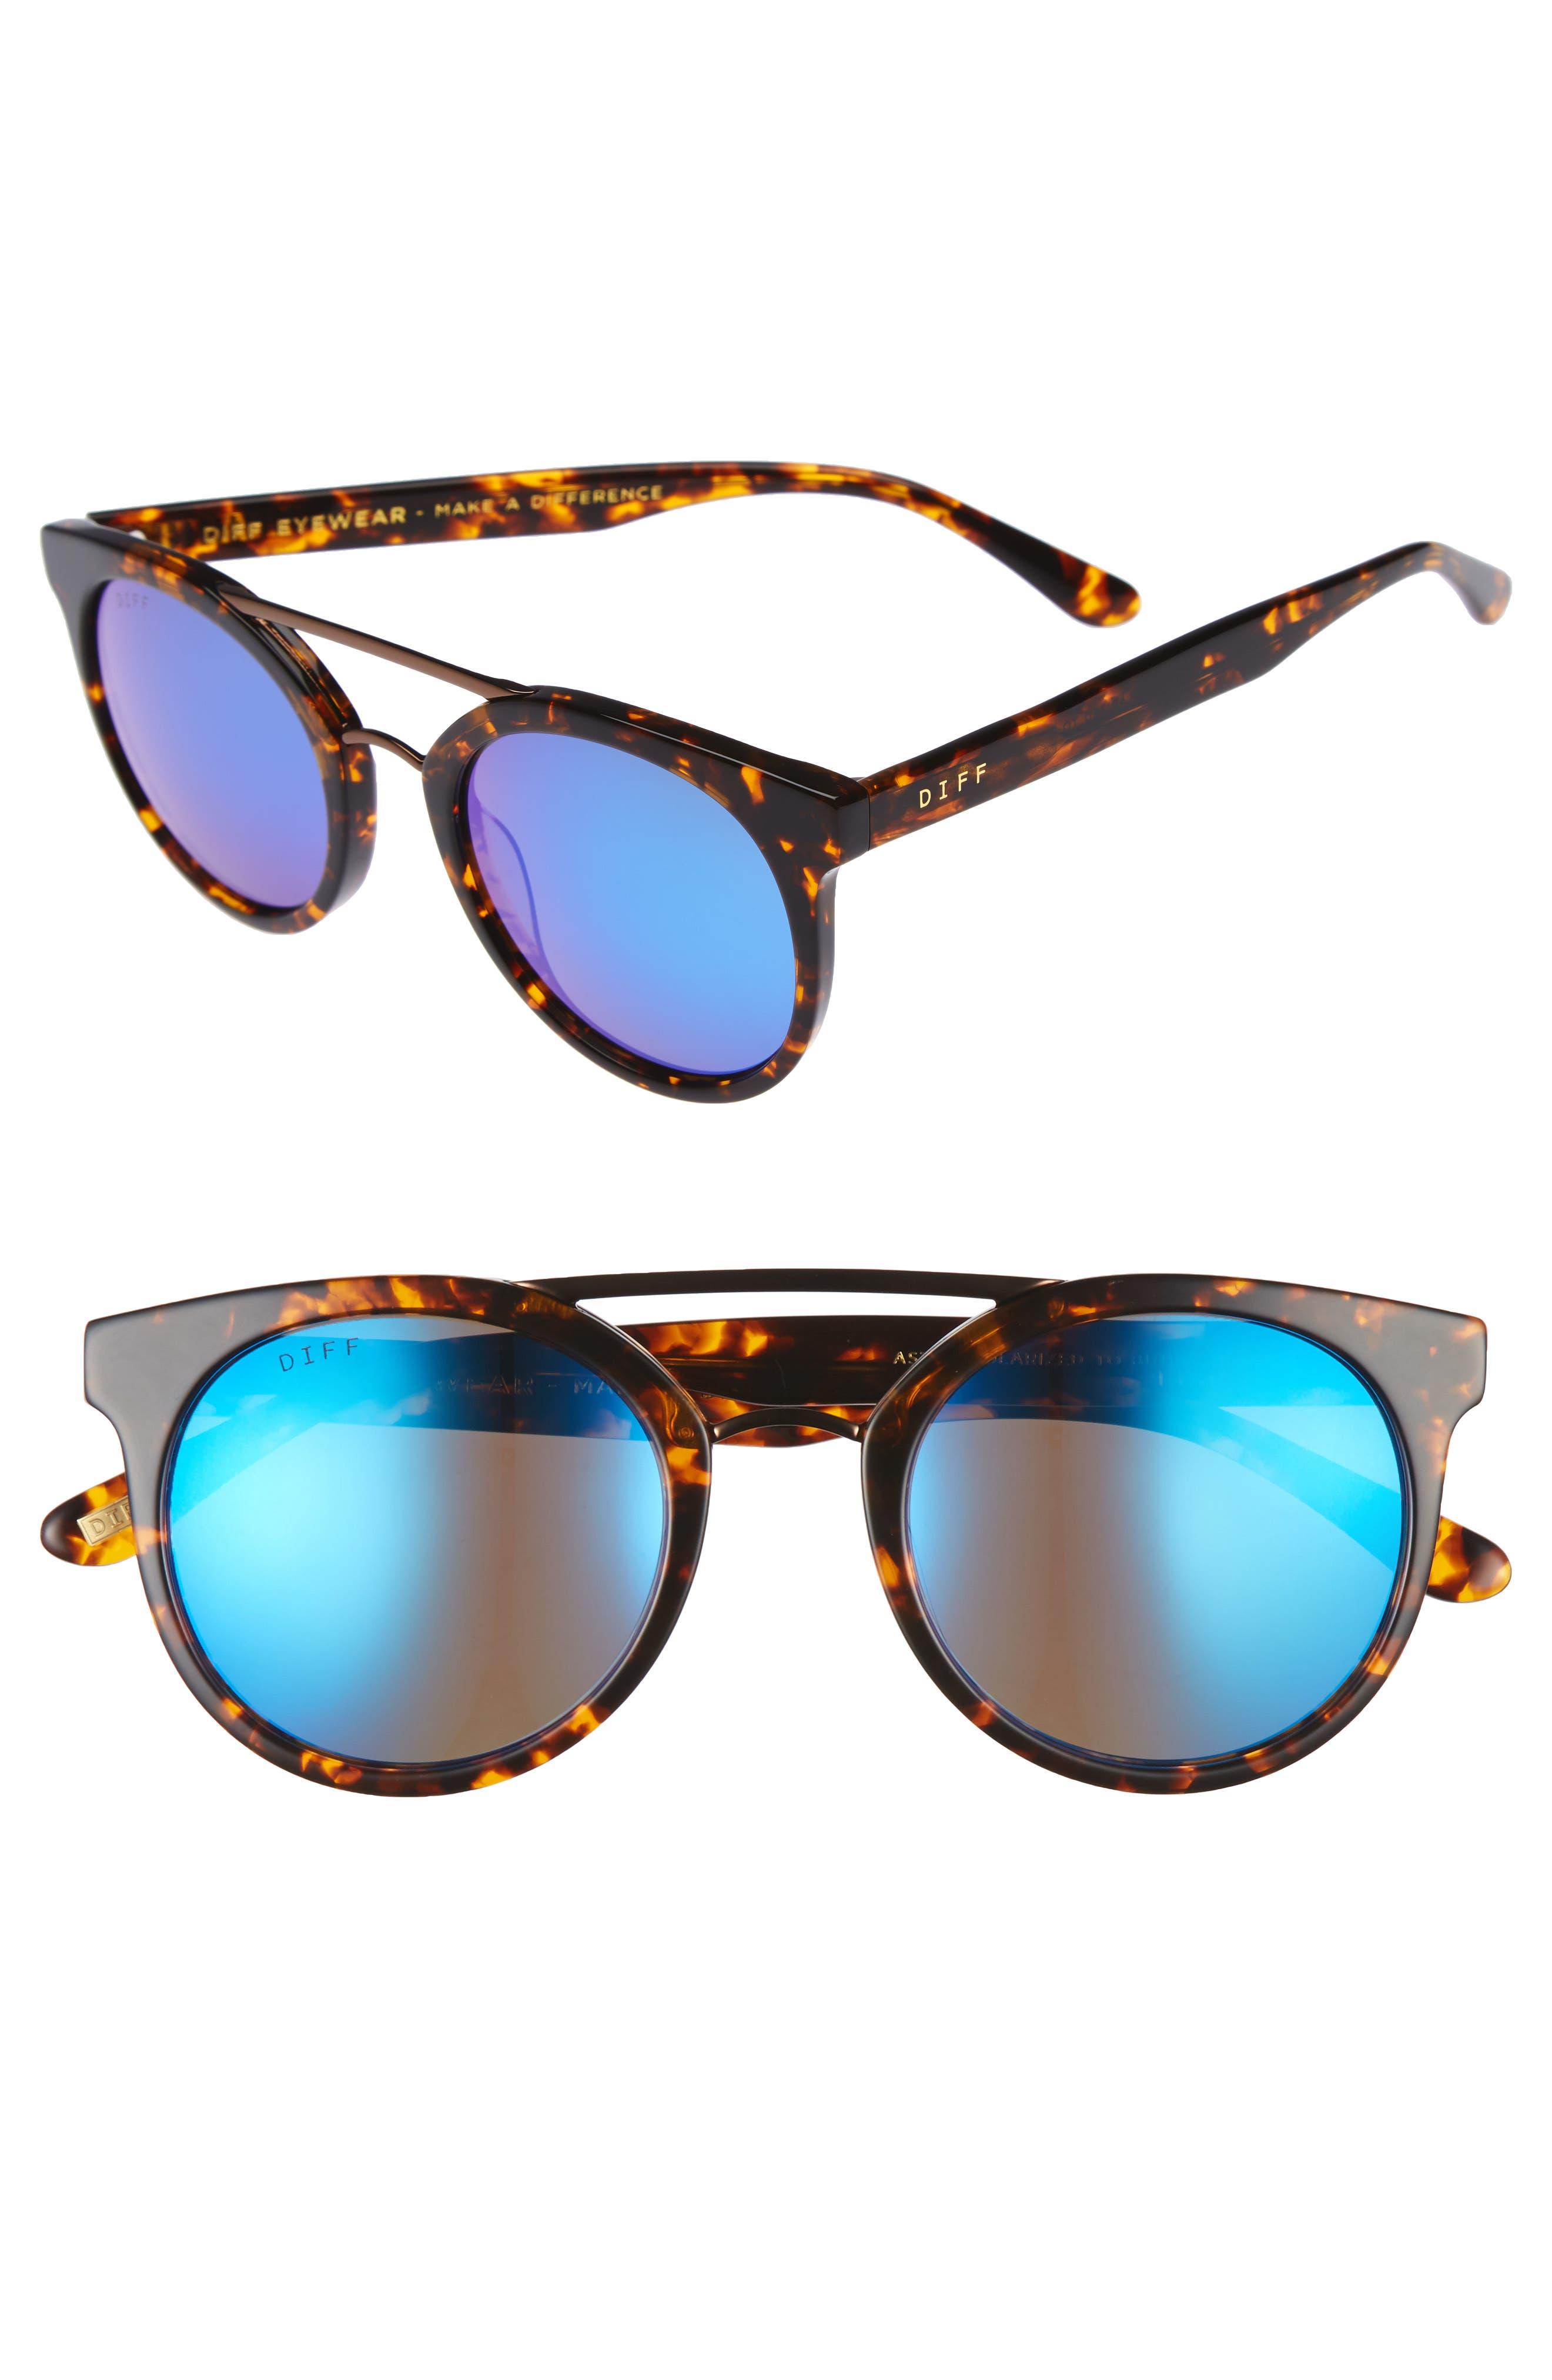 Main Image - DIFF Astro 49mm Polarized Aviator Sunglasses